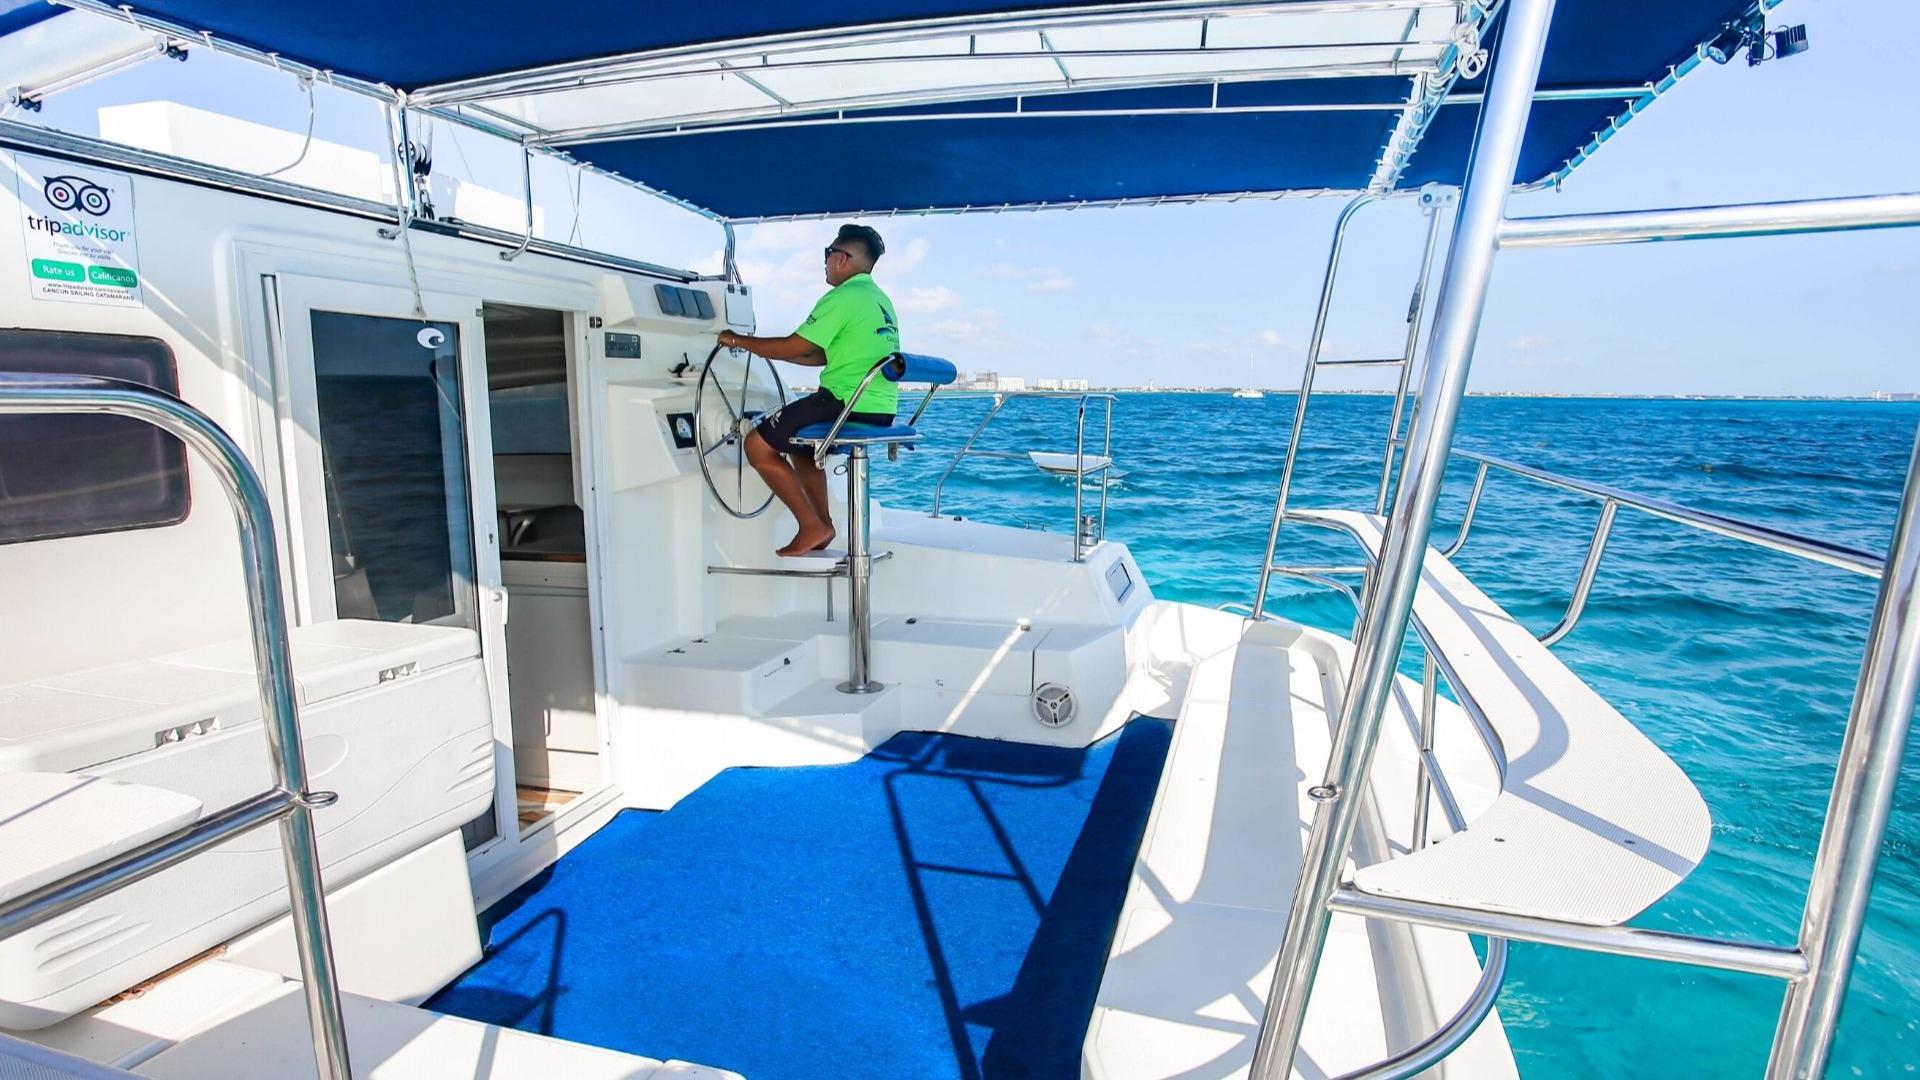 6 - LowRes - Pachanga - Private Isla Mujeres catamaran tour - Cancun Sailing